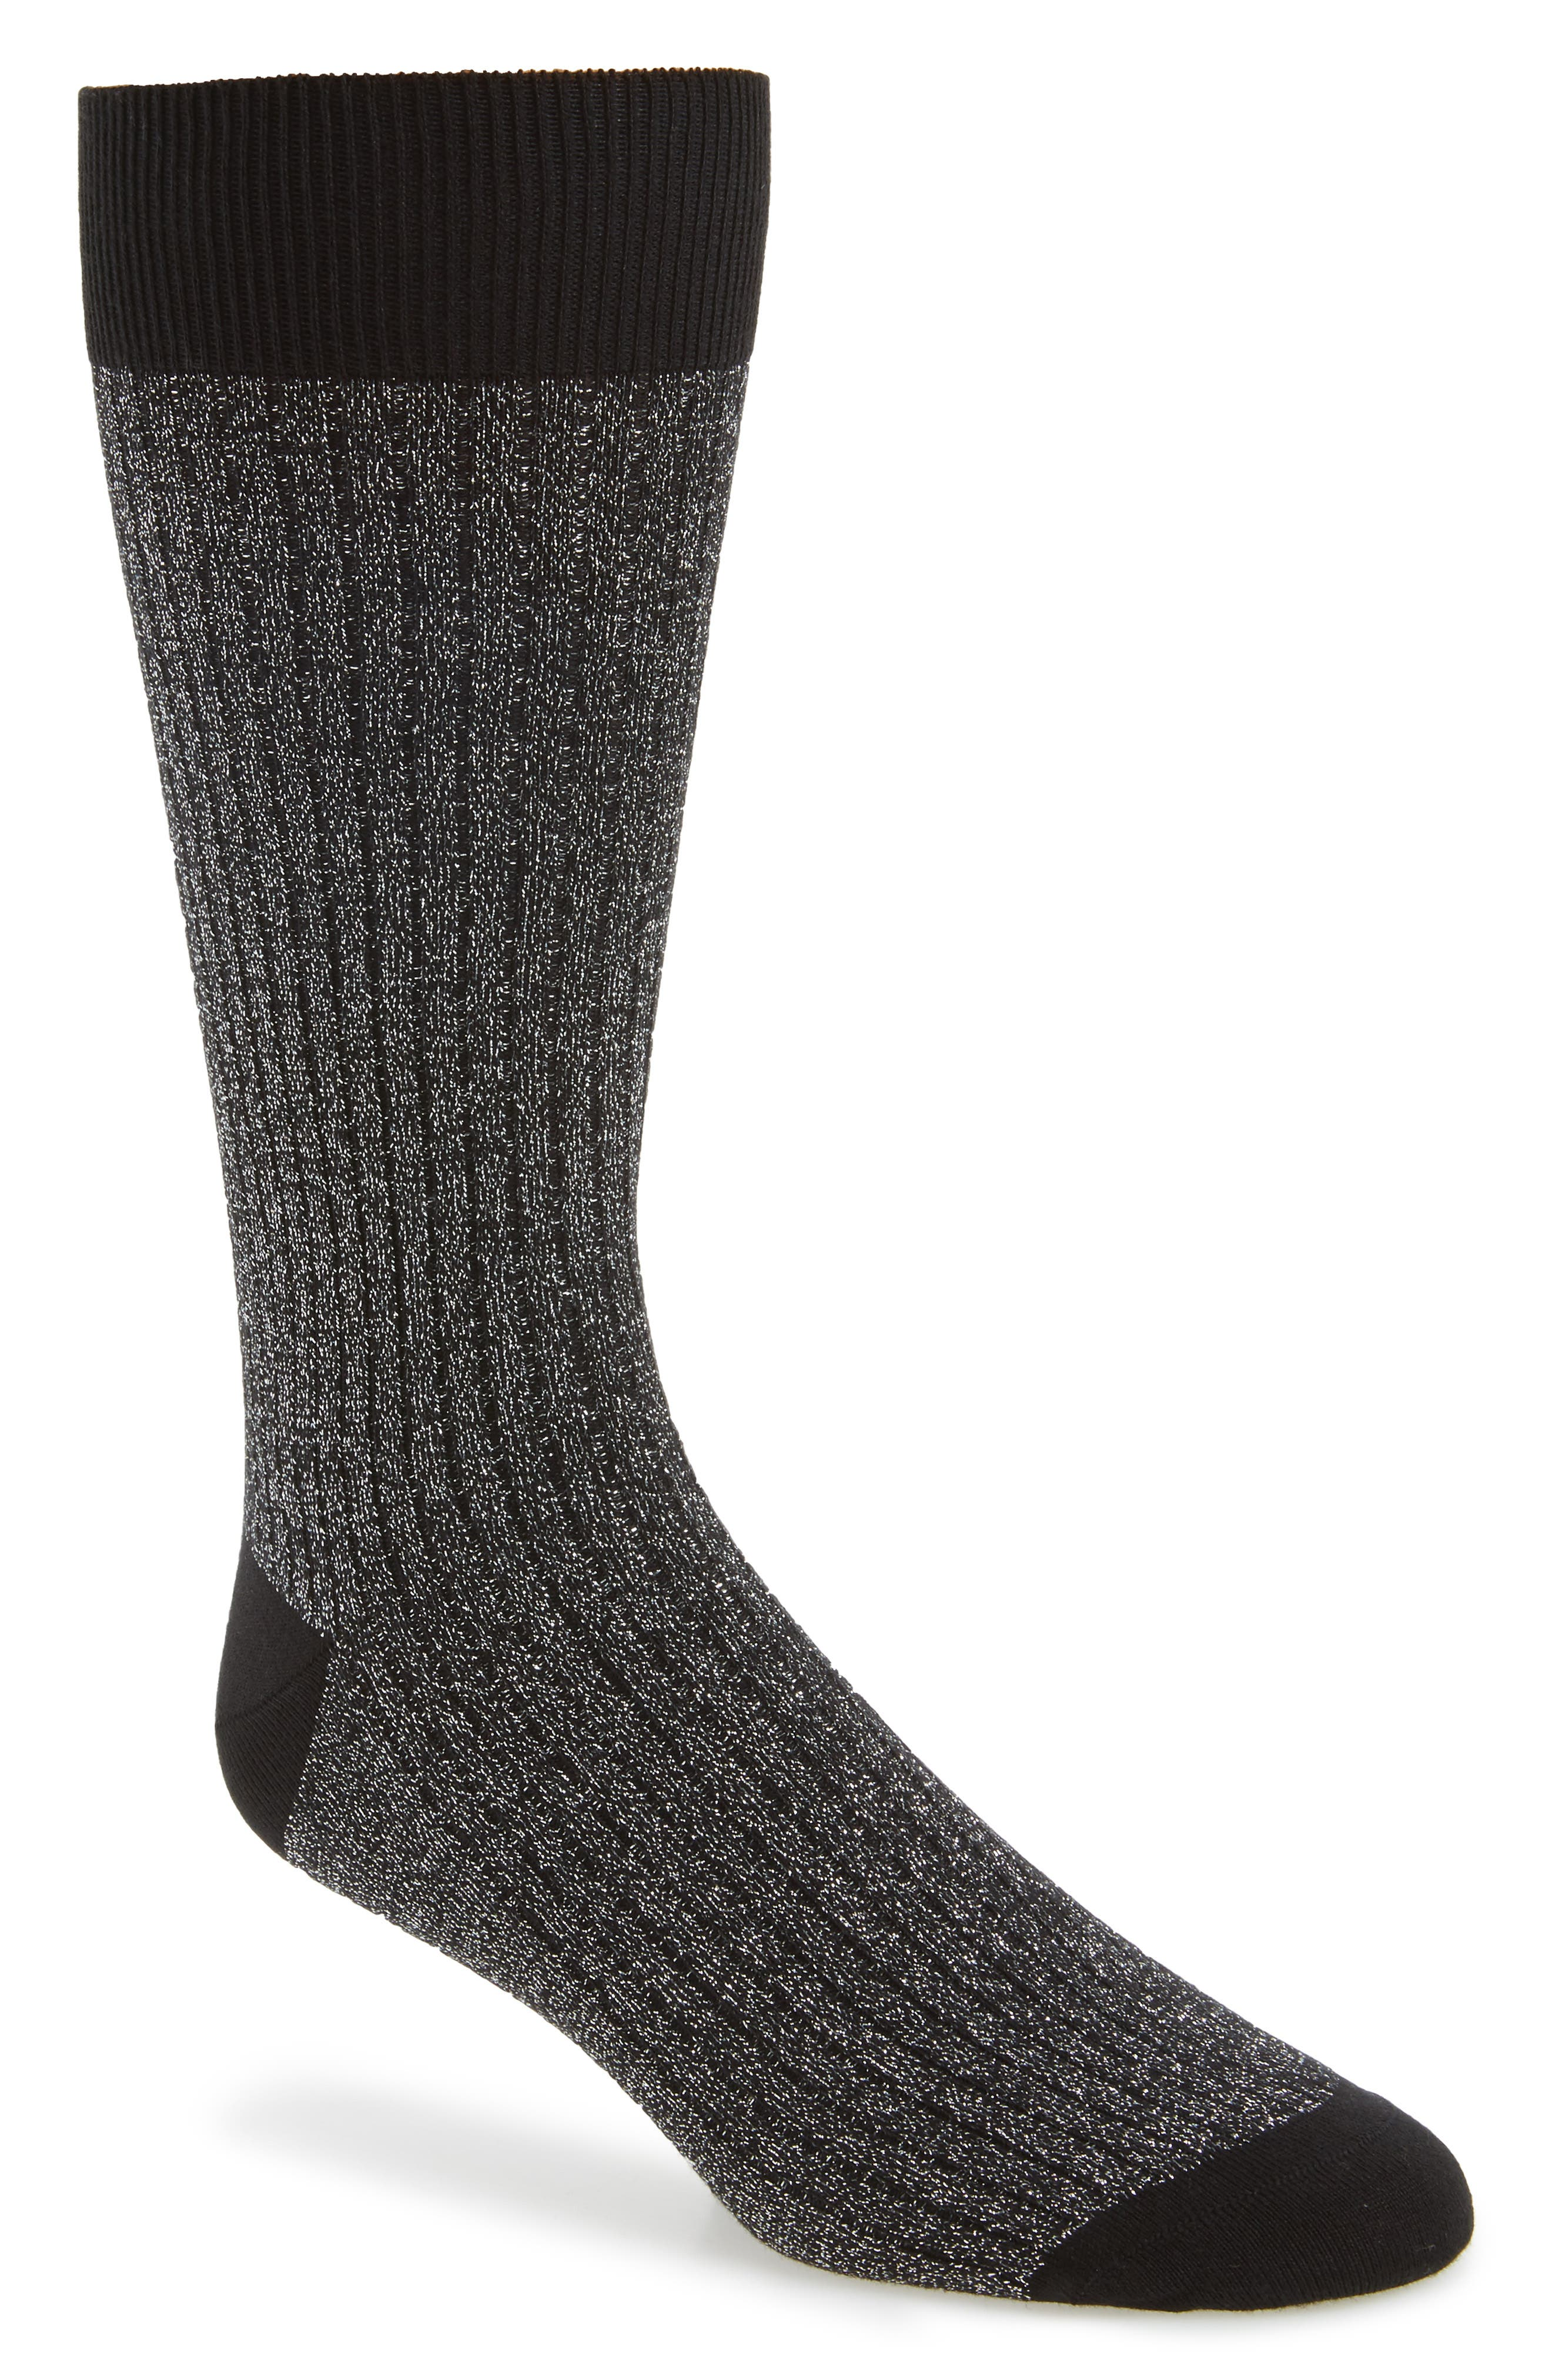 Pantherella Sparkle Socks